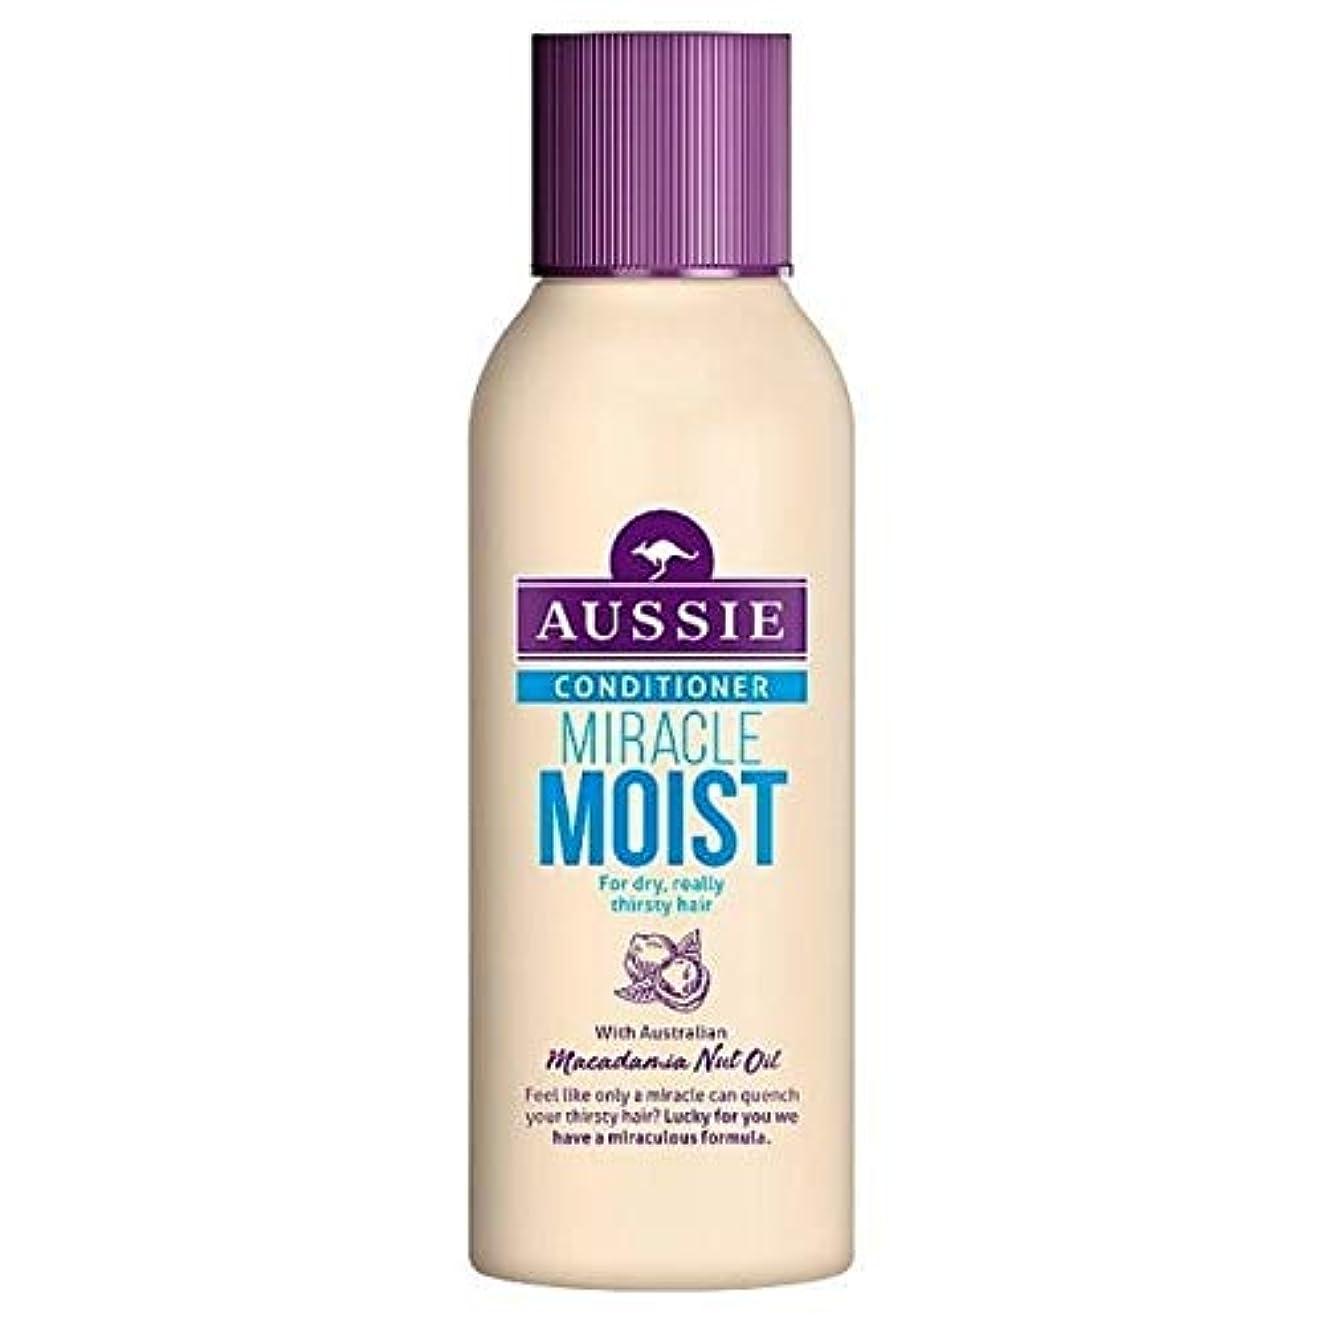 [Aussie ] 乾いた、のどが渇い毛90ミリリットルのためのオーストラリアの奇跡しっとりコンディショナー - Aussie Miracle Moist Conditioner For Dry, Thirsty Hair...